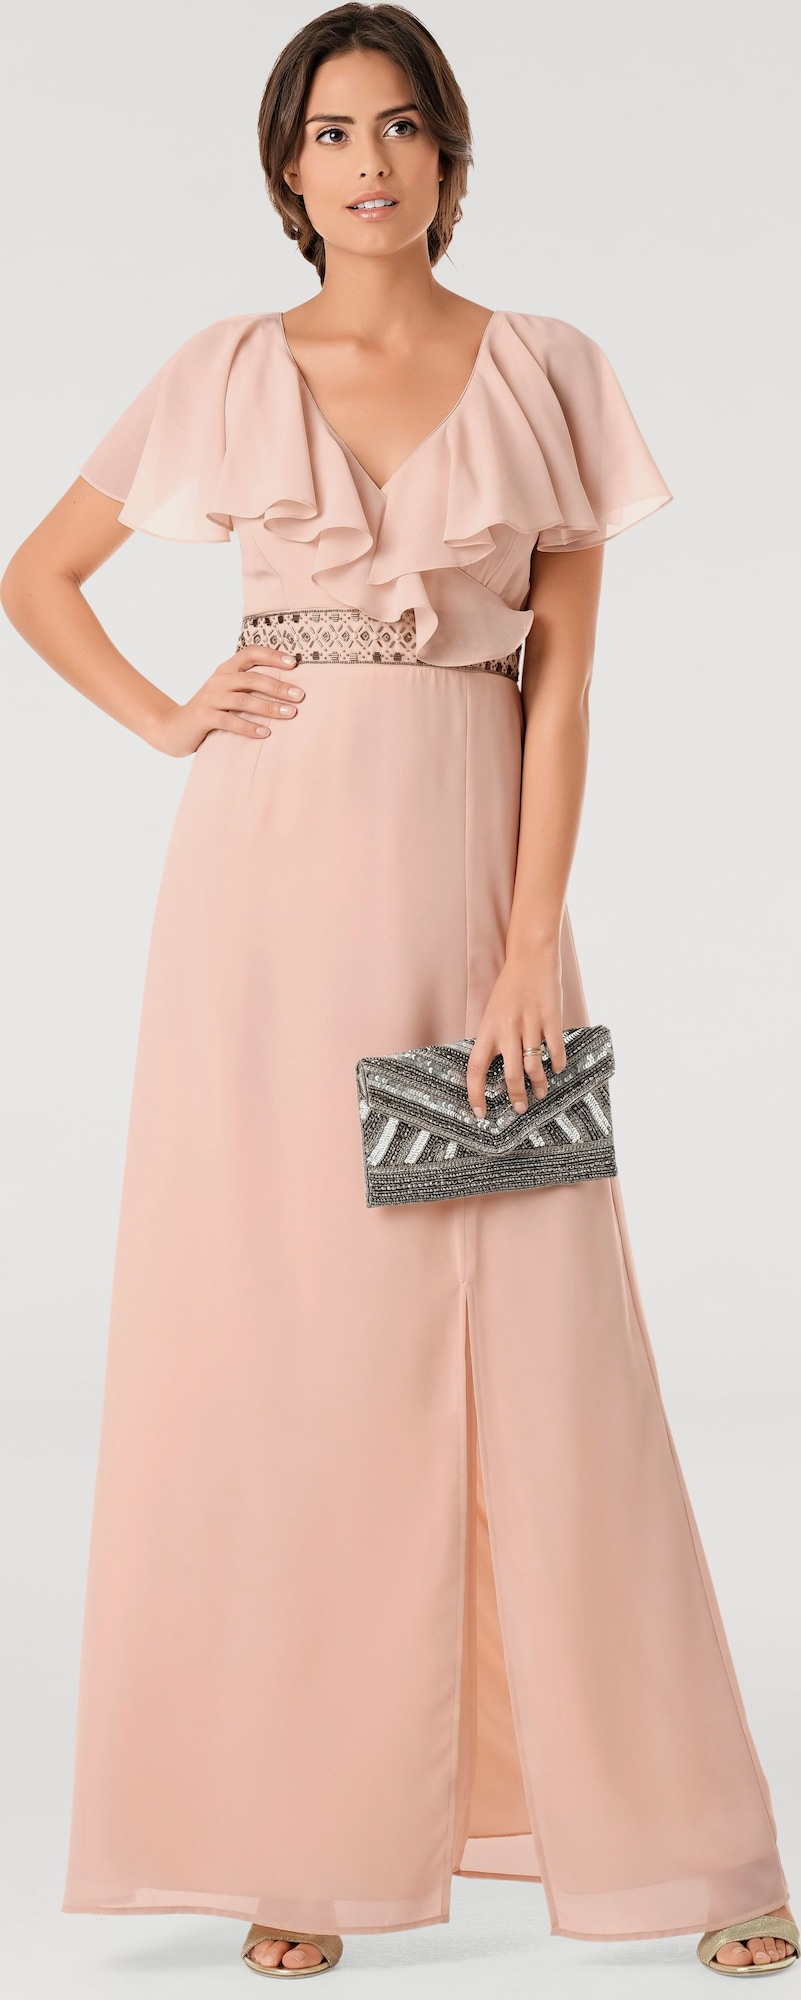 ashley brooke by heine abendkleid mit schlitz in pink about you. Black Bedroom Furniture Sets. Home Design Ideas